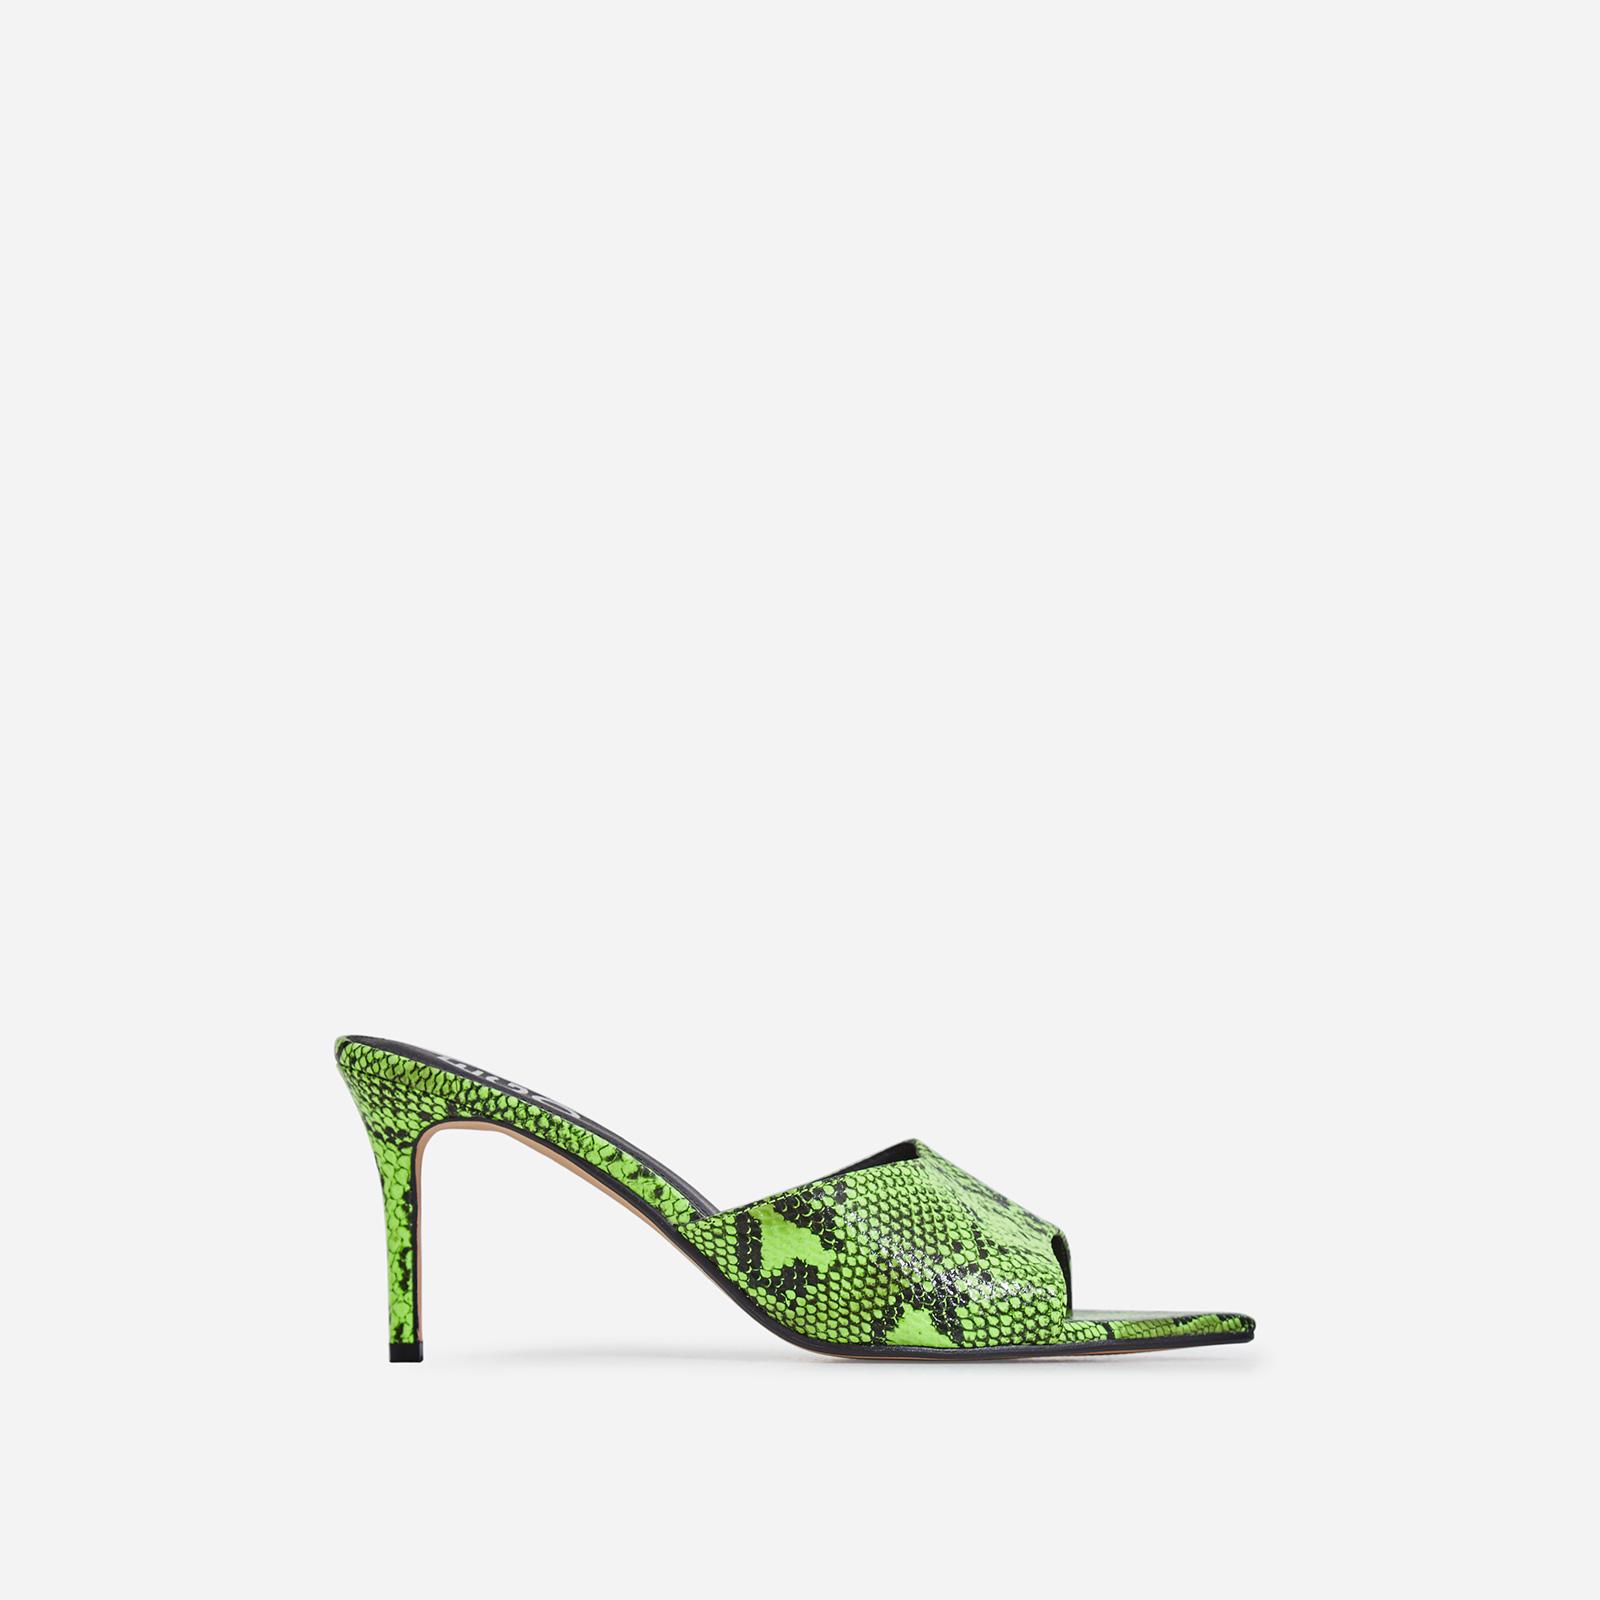 Sansa Pointed Peep Toe Heel Mule In Lime Green Snake Print Faux Leather